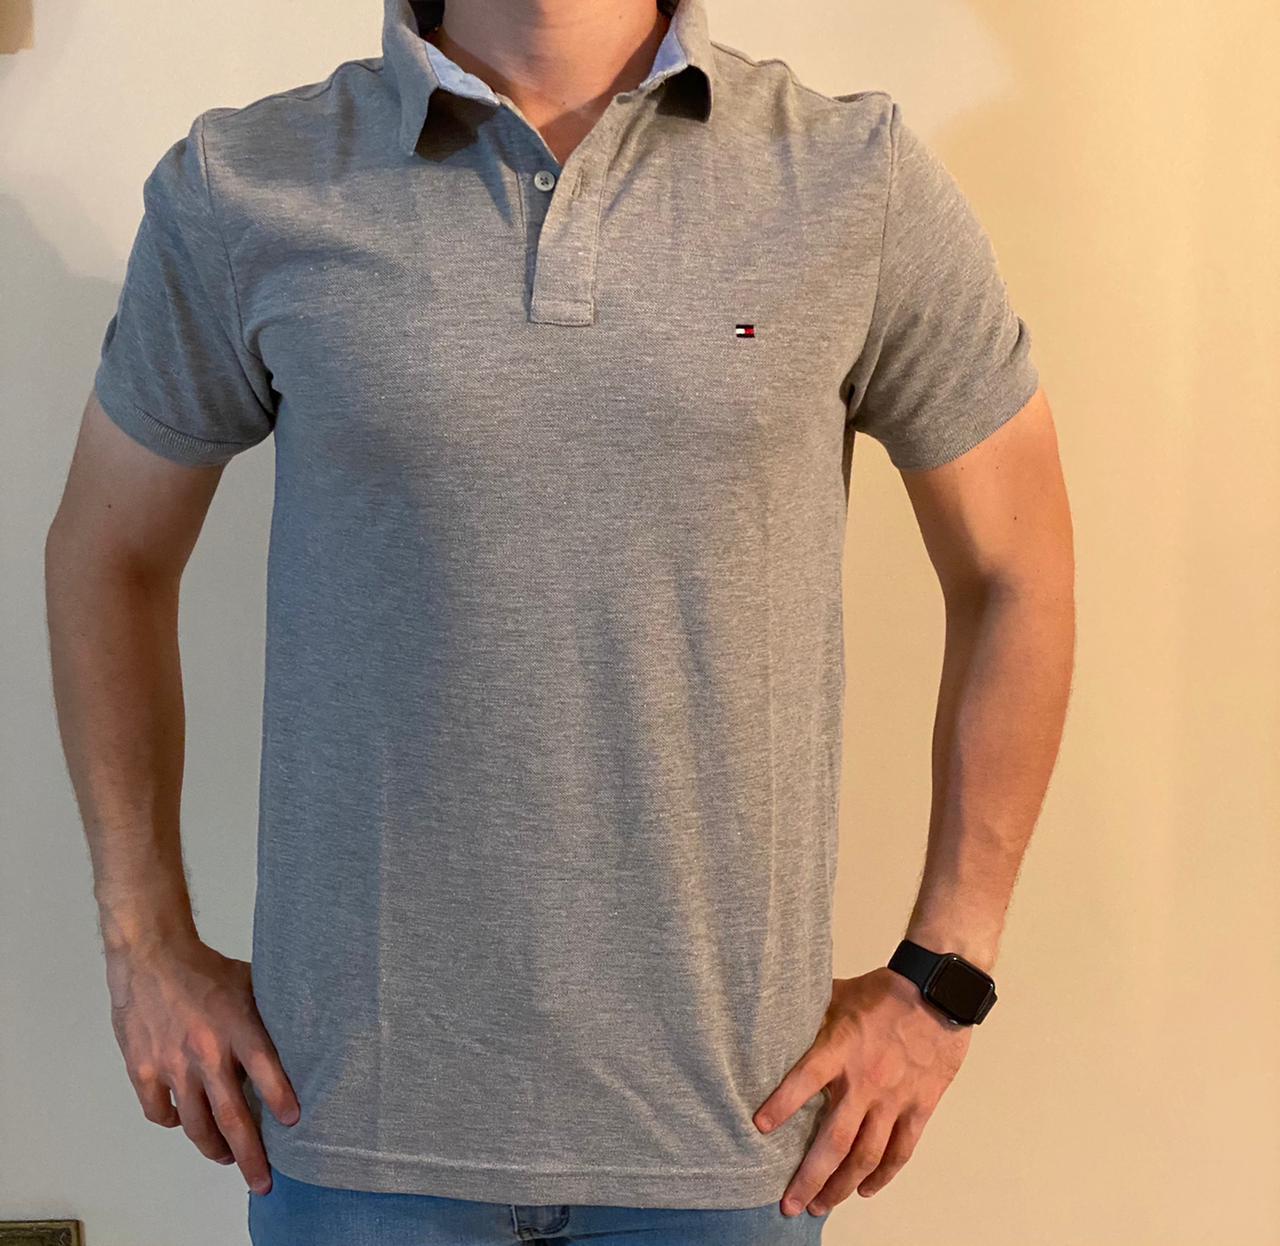 Camiseta Masculina Tommy Hilfiger Gola Polo Algodão Lisa - Cinza